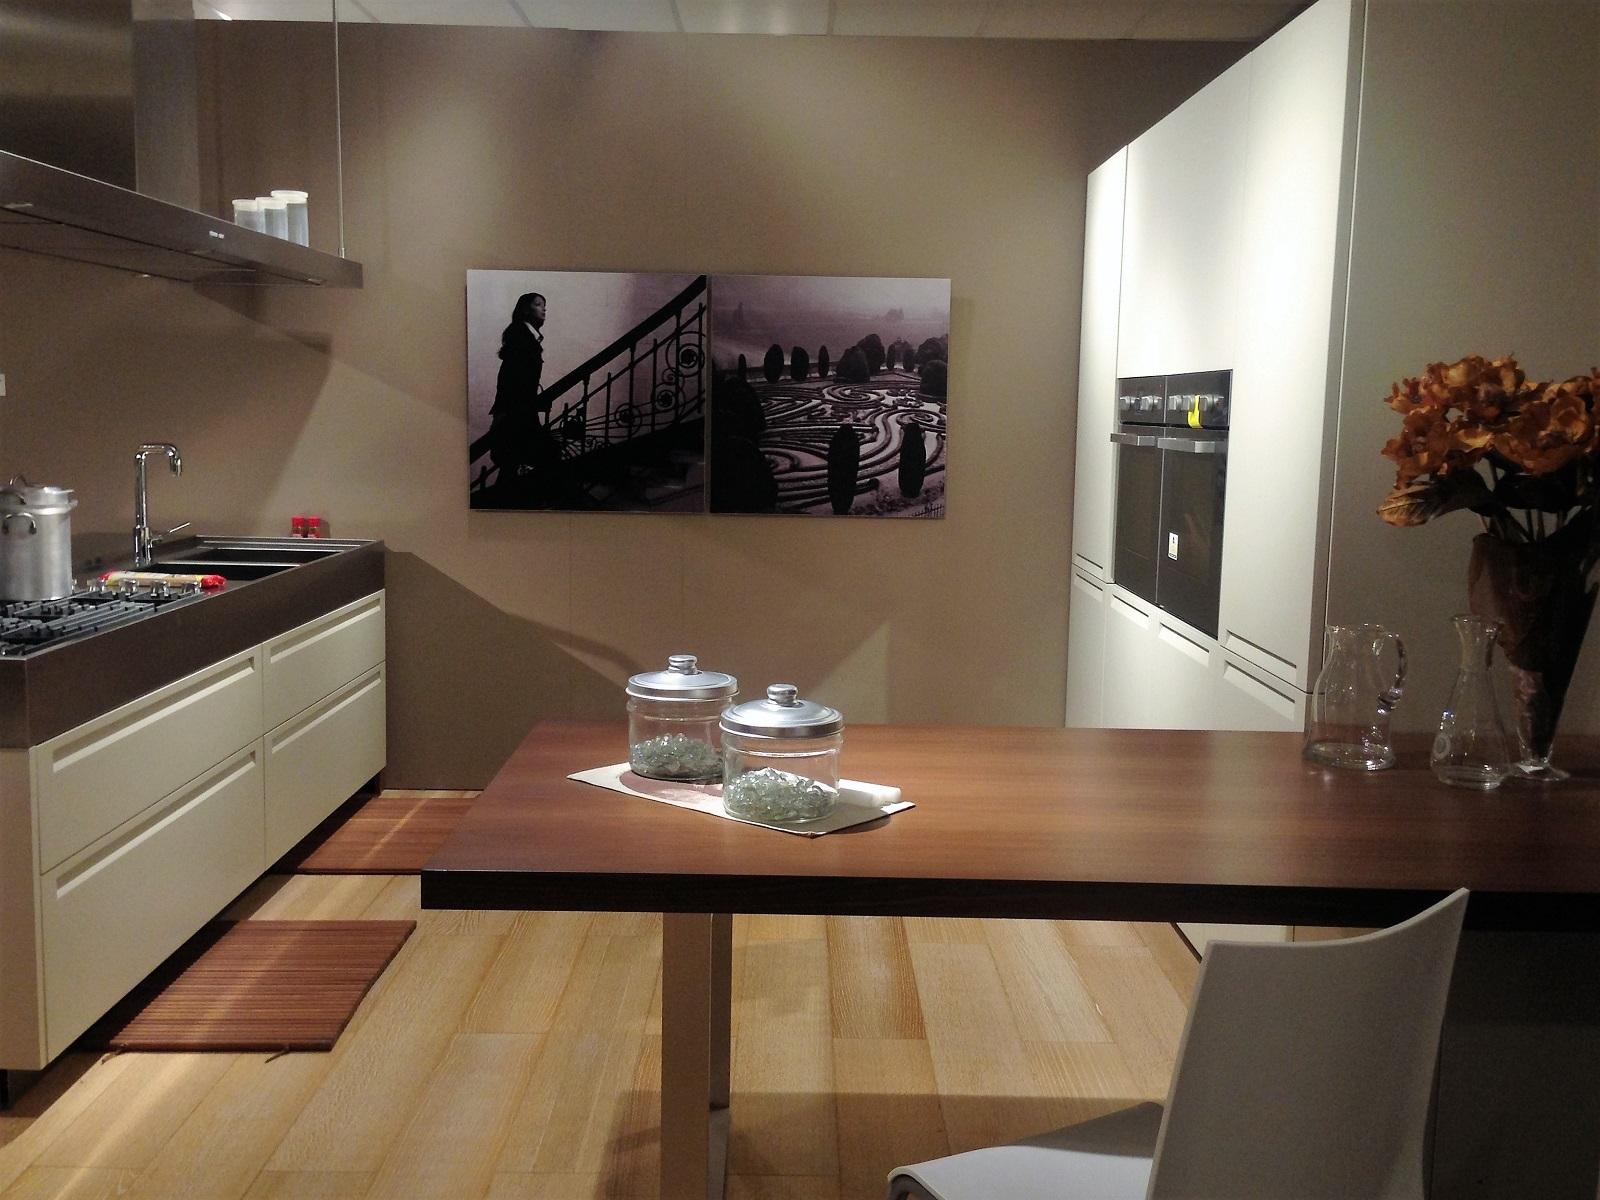 Cucina Minimal Varenna : Cucina varenna minimal scontato del cucine a